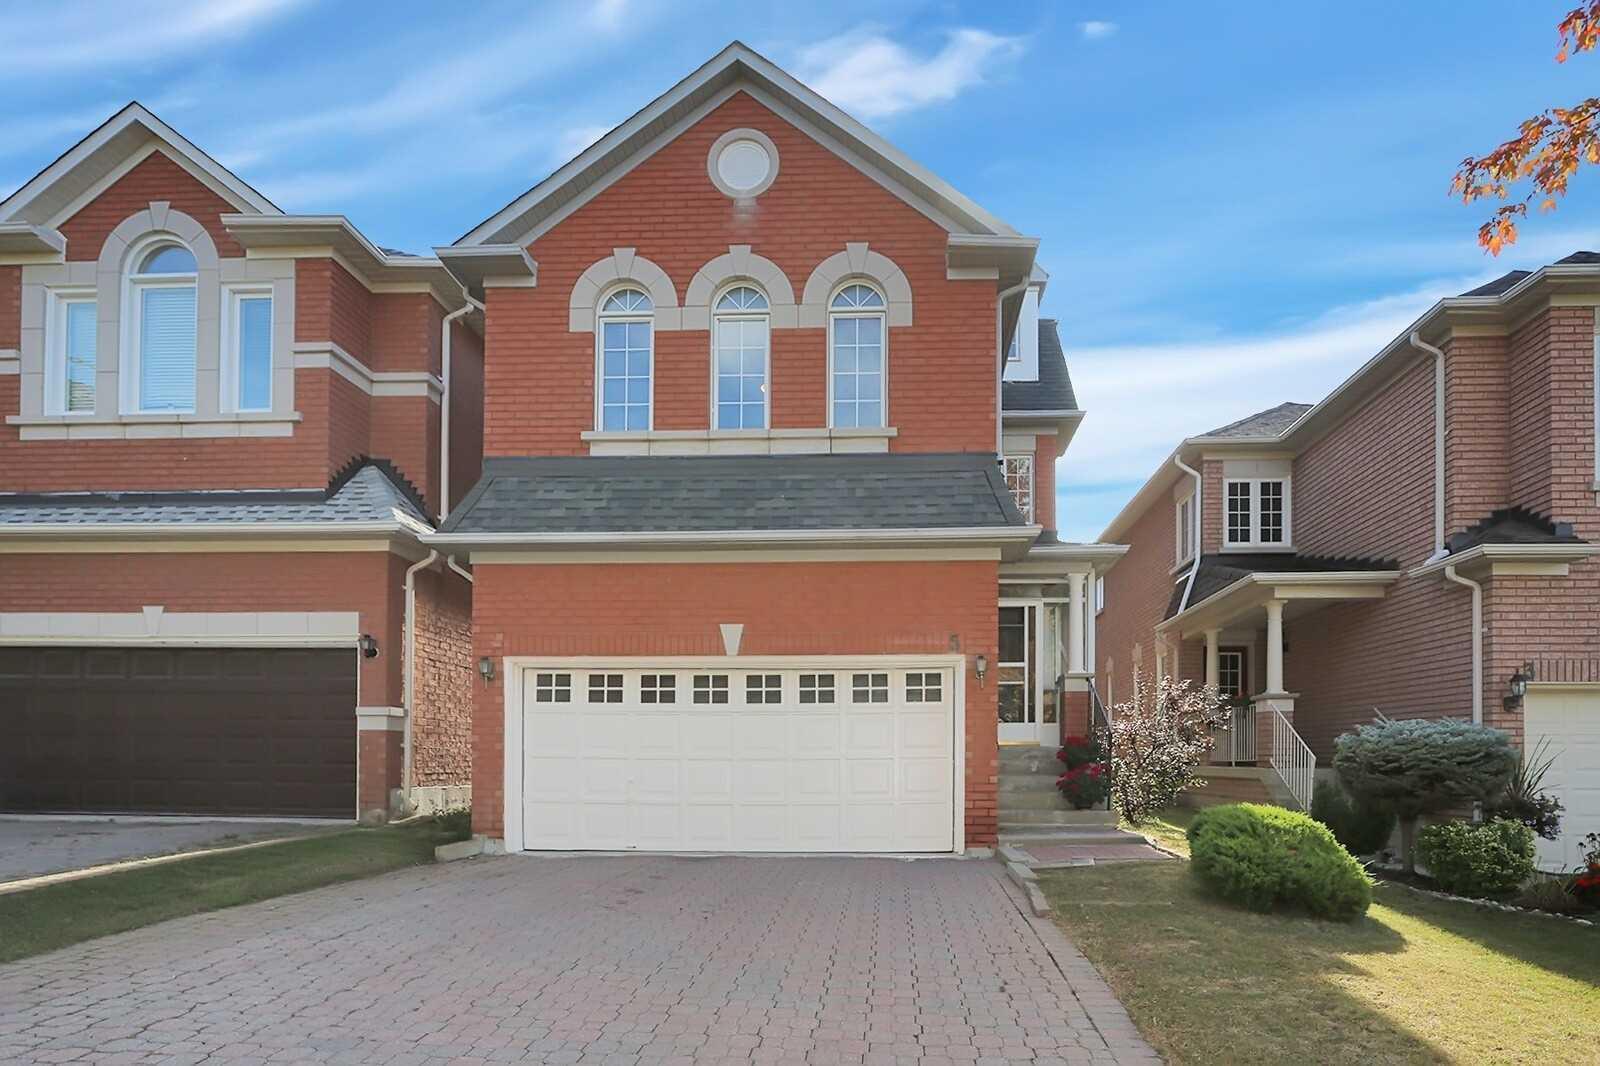 Detached house For Sale In Richmond Hill - 5 Futura Ave, Richmond Hill, Ontario, Canada L4S1V2 , 5 Bedrooms Bedrooms, ,5 BathroomsBathrooms,Detached,For Sale,Futura